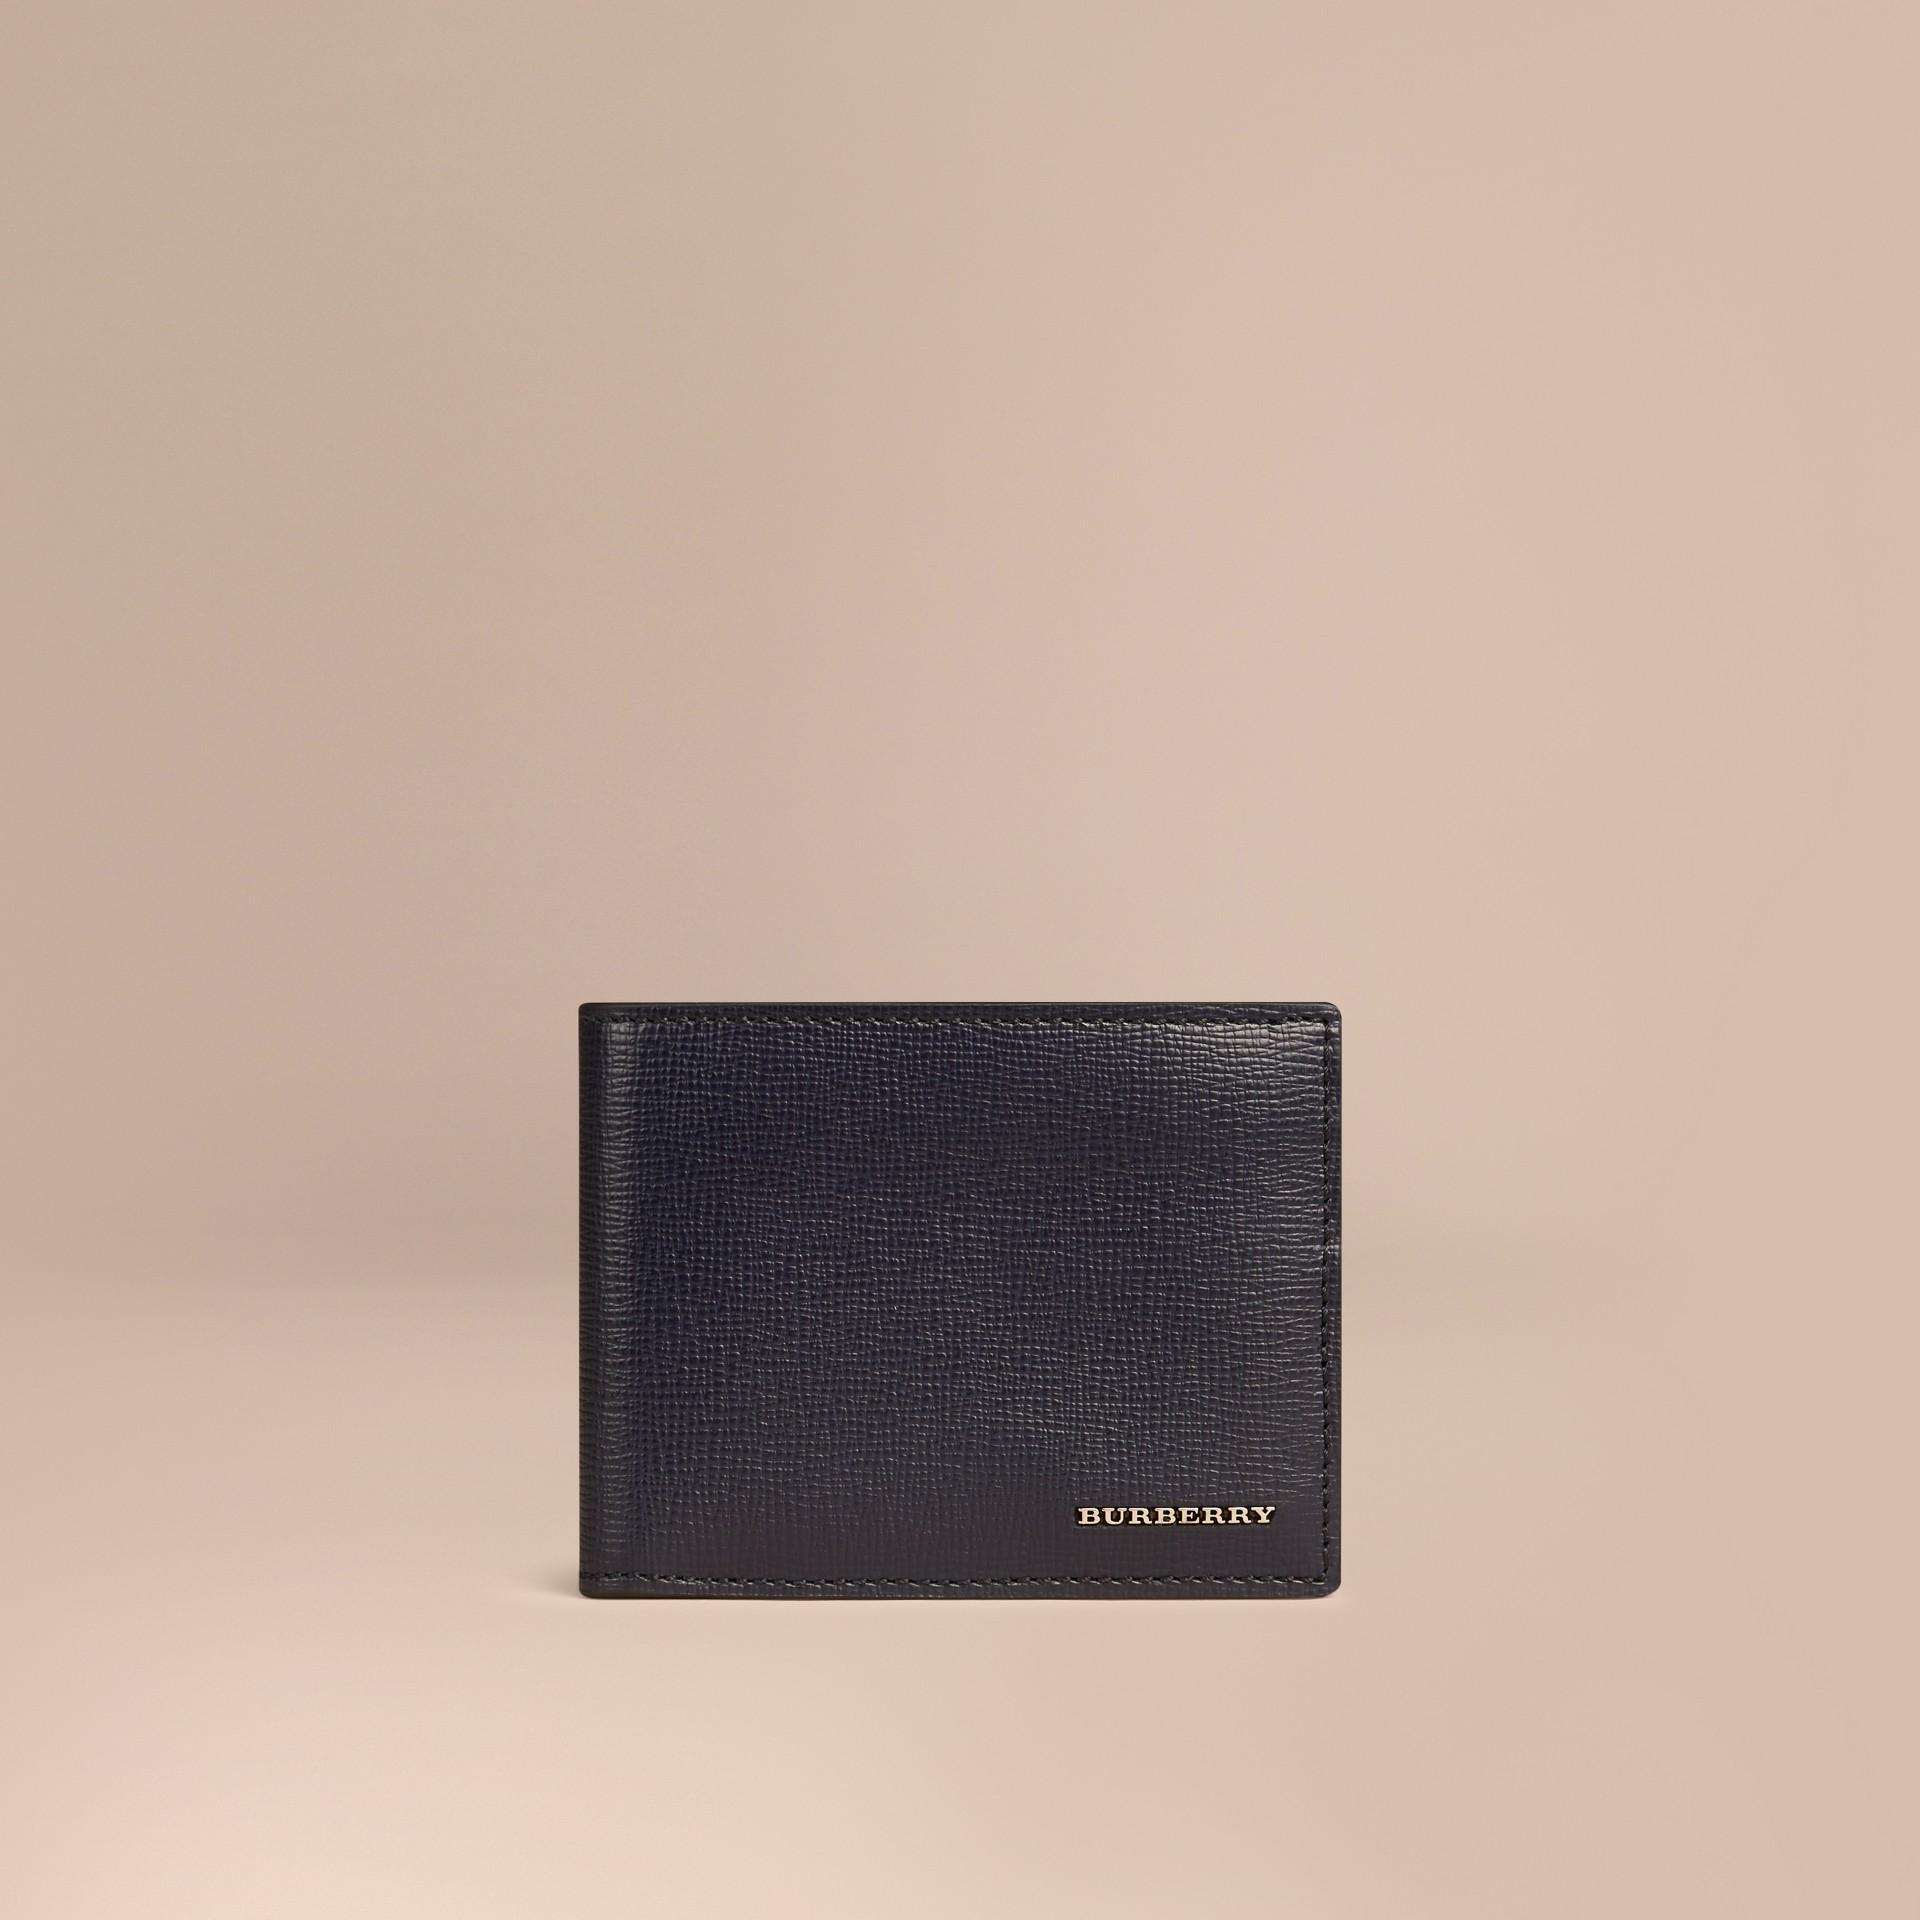 Dark navy London Leather Folding Wallet Dark Navy - gallery image 1